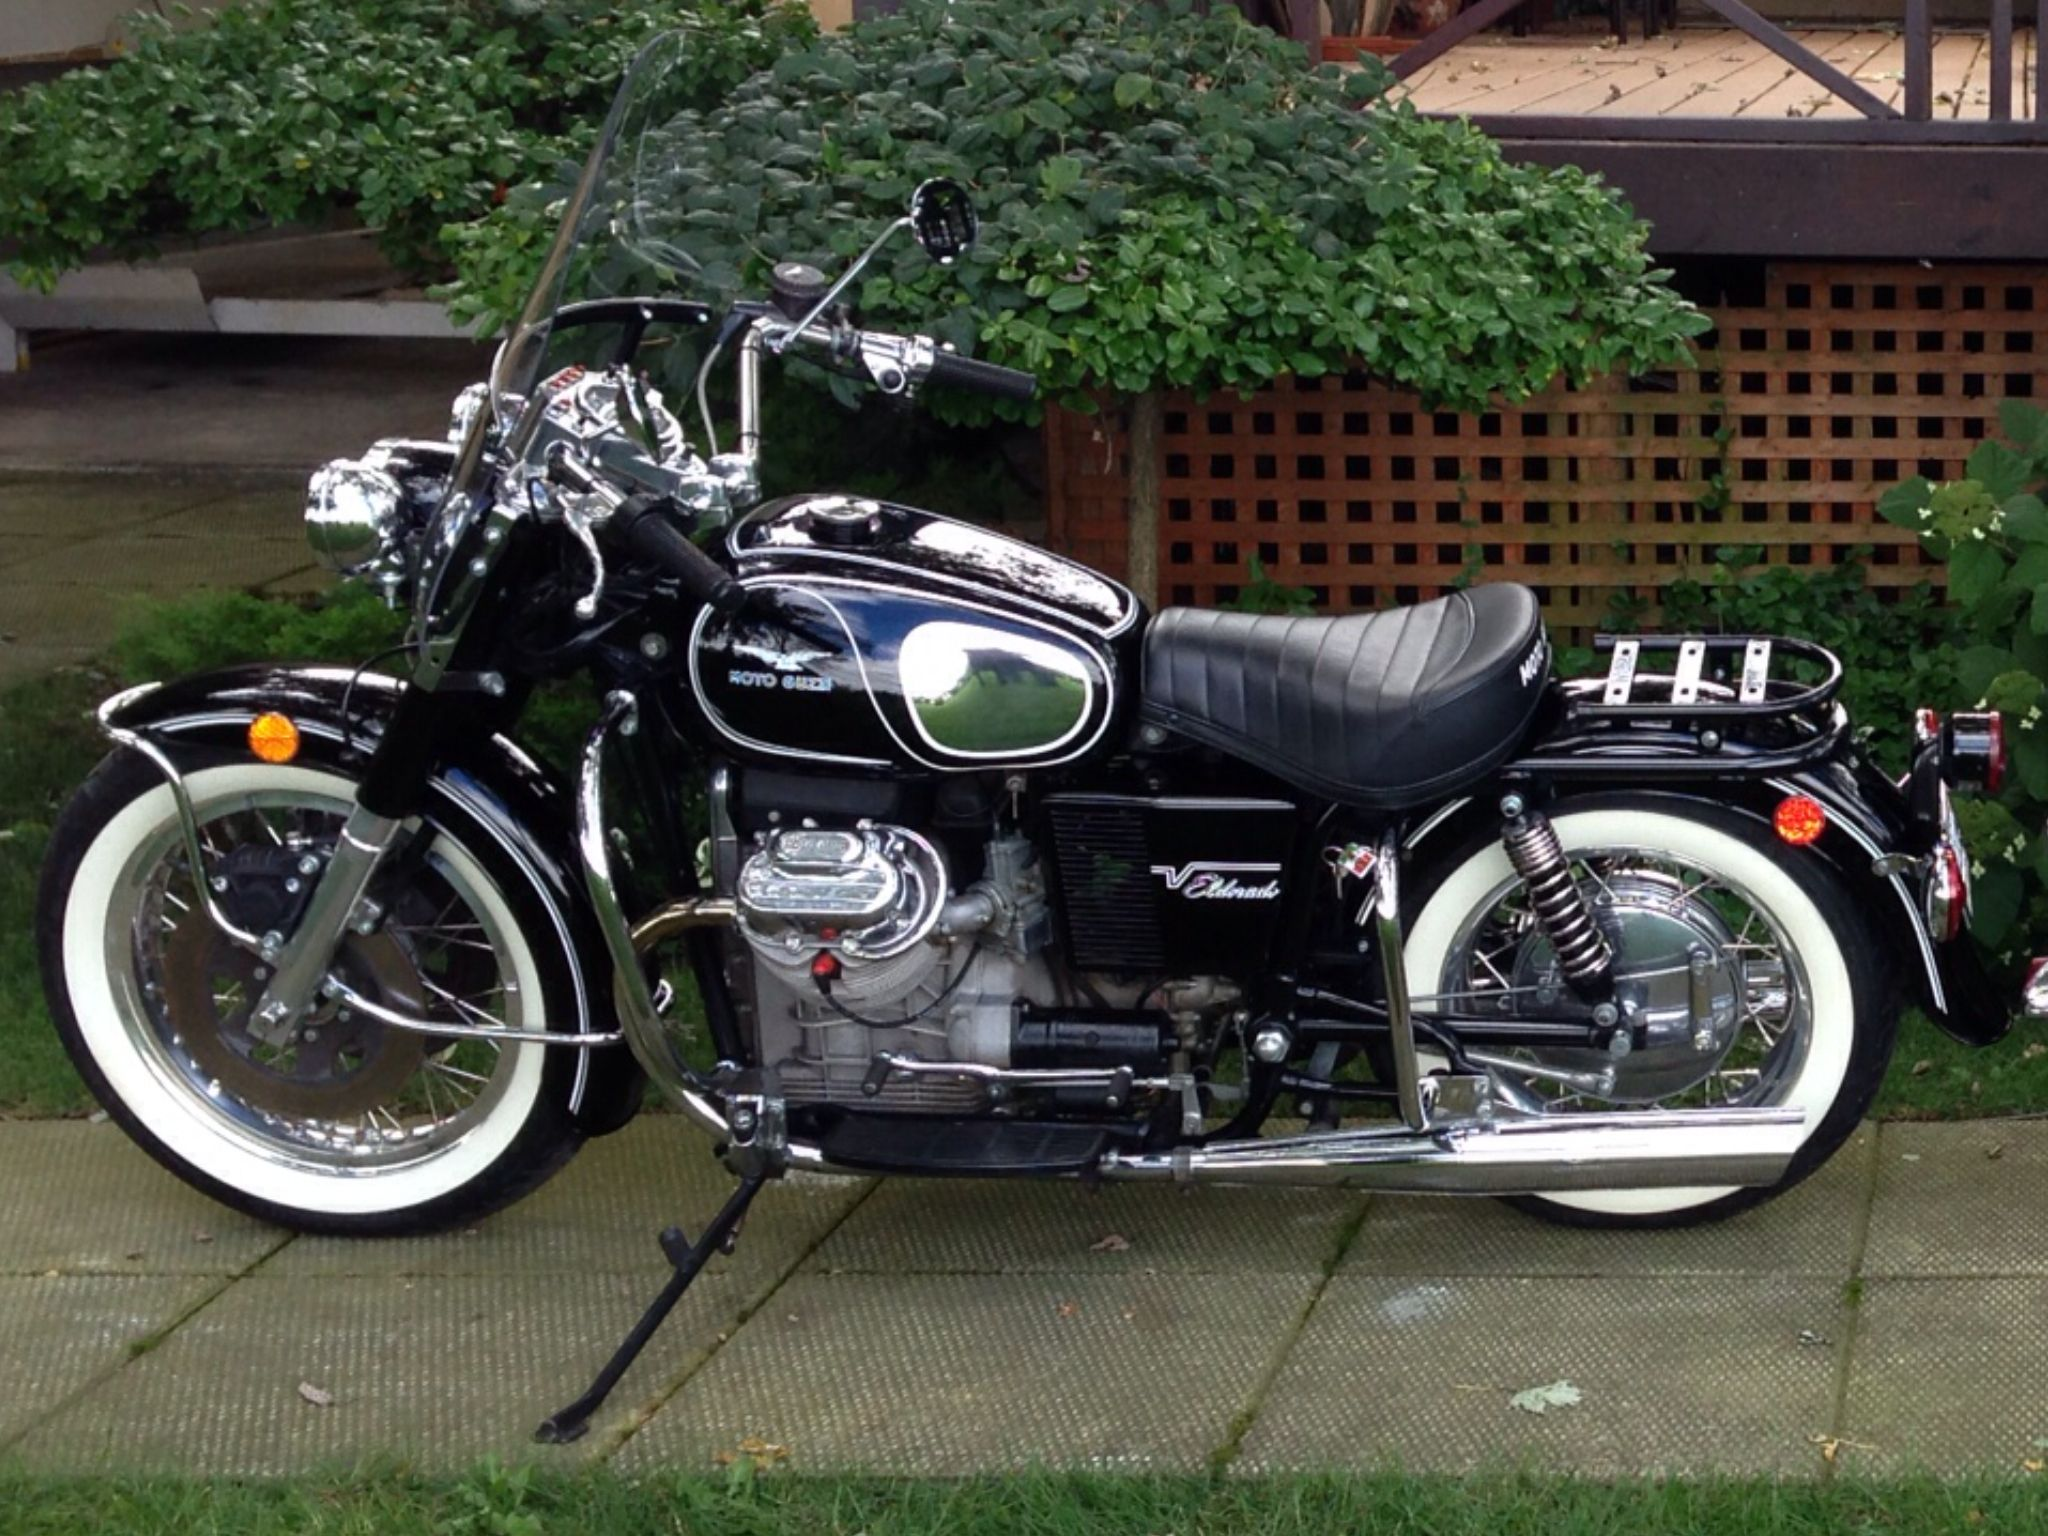 109 best moto guzzi images on pinterest | moto guzzi, vintage